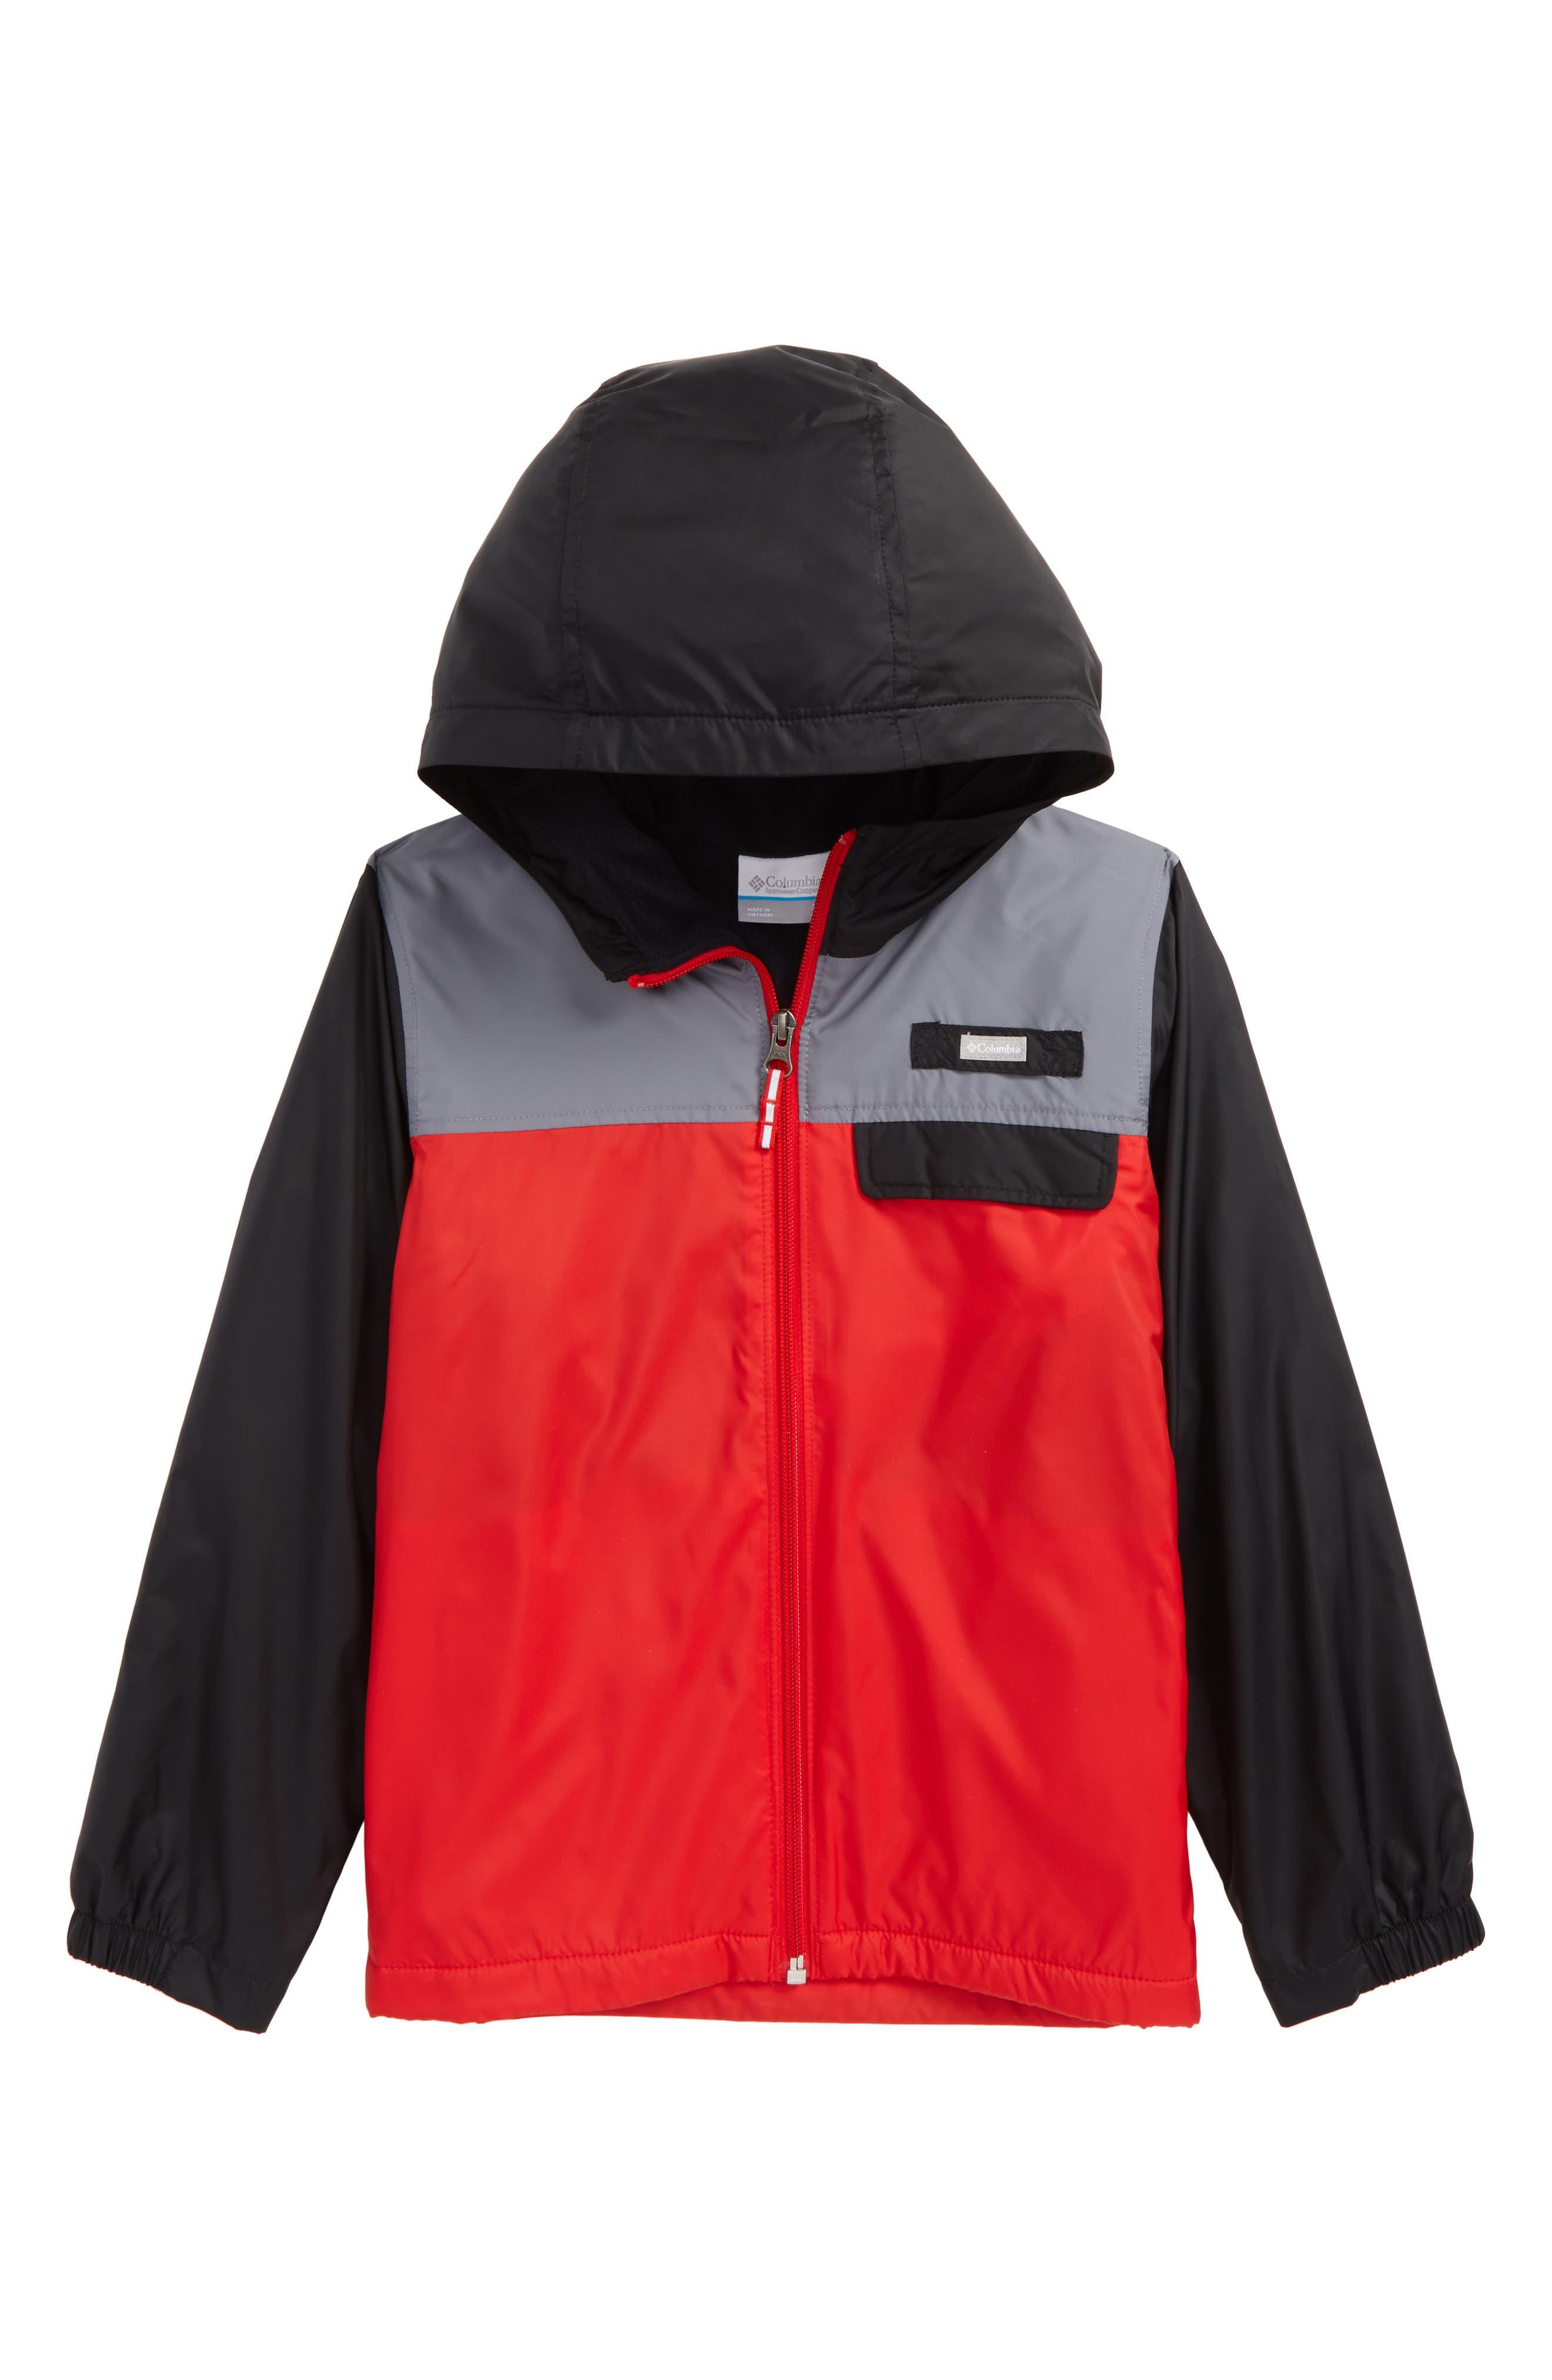 Mountain Side Water Resistant Windbreaker Jacket,                         Main,                         color, Bright Red/ Grey Ash/Black